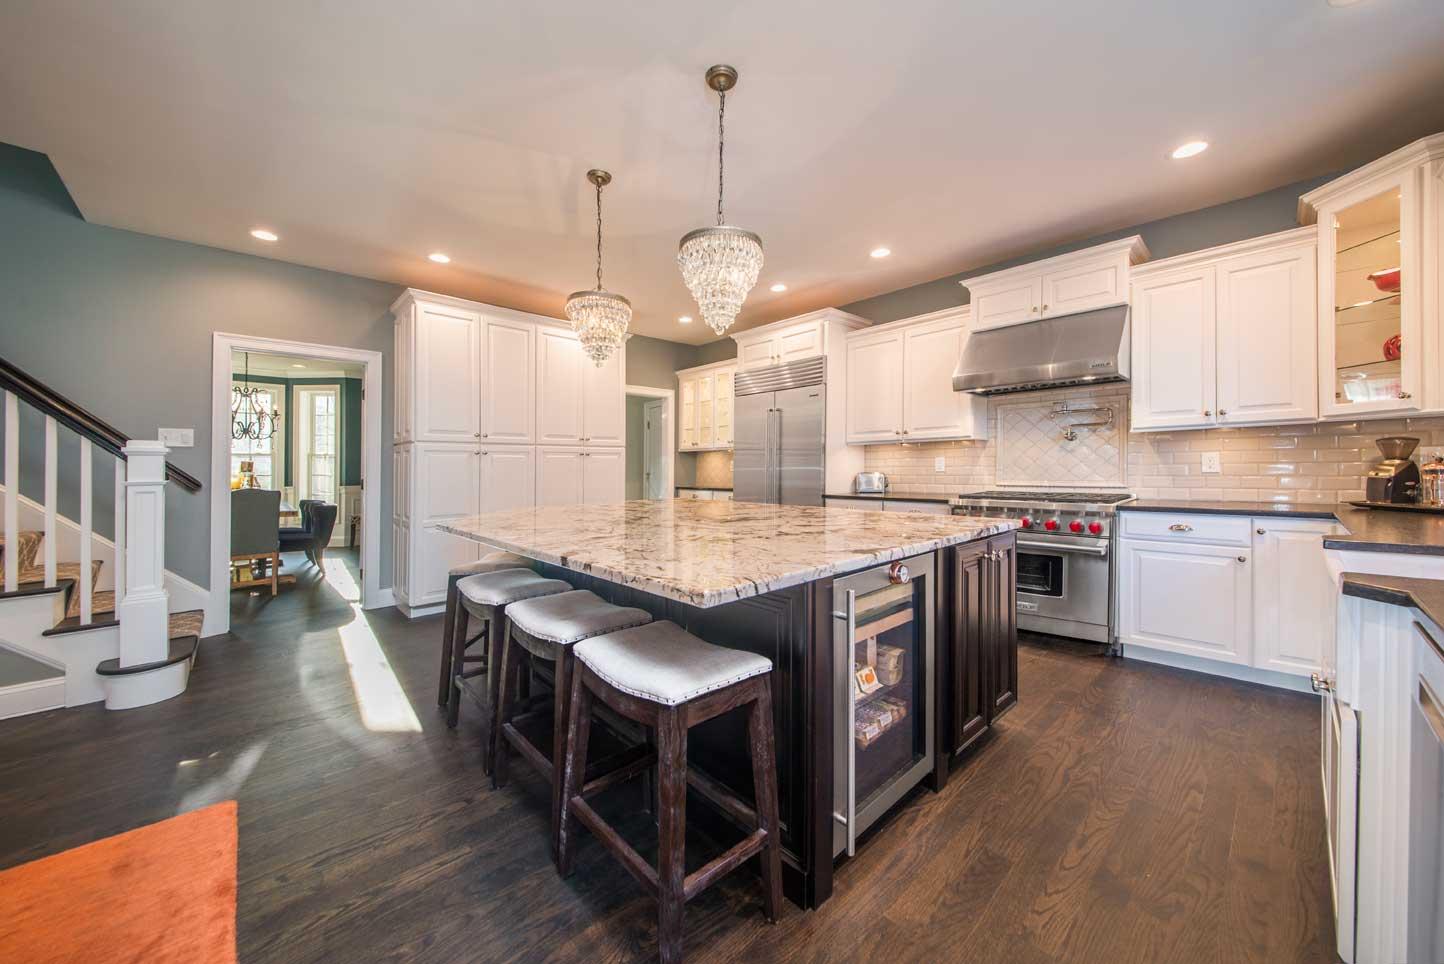 sandi lanigan interiors interior design home staging. Black Bedroom Furniture Sets. Home Design Ideas